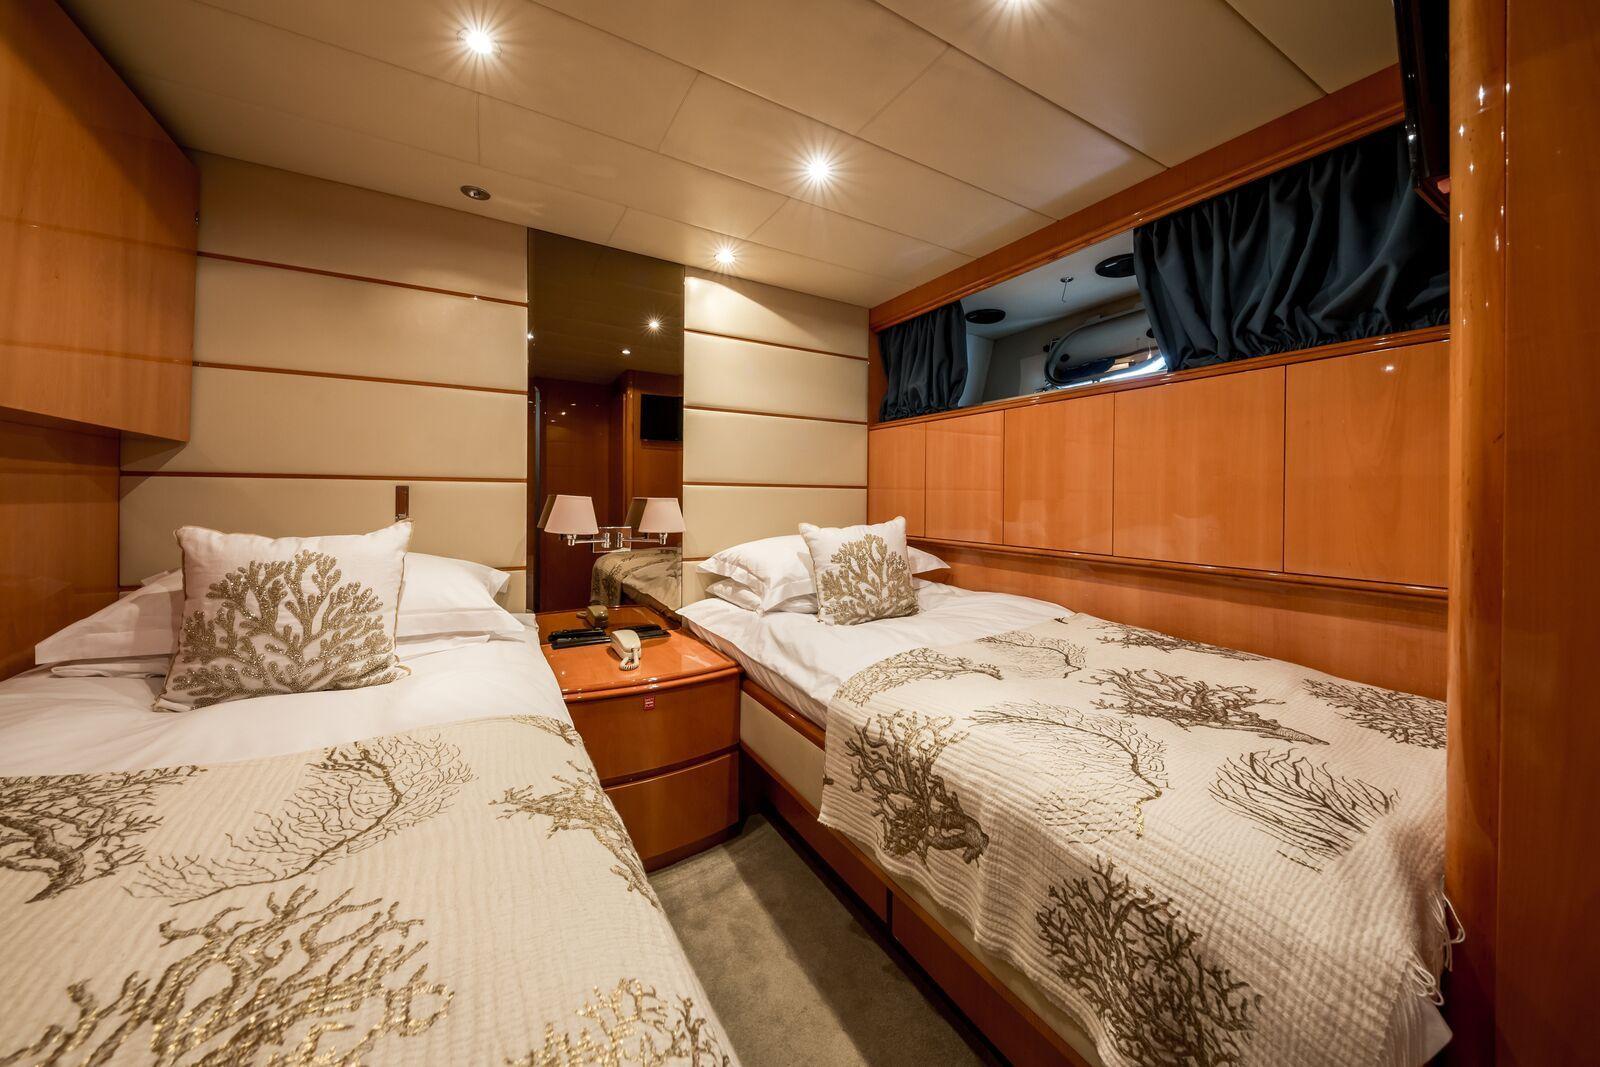 INDULGENCE OF POOLE Mangusta 86 Luxury Superyacht Twin Cabin